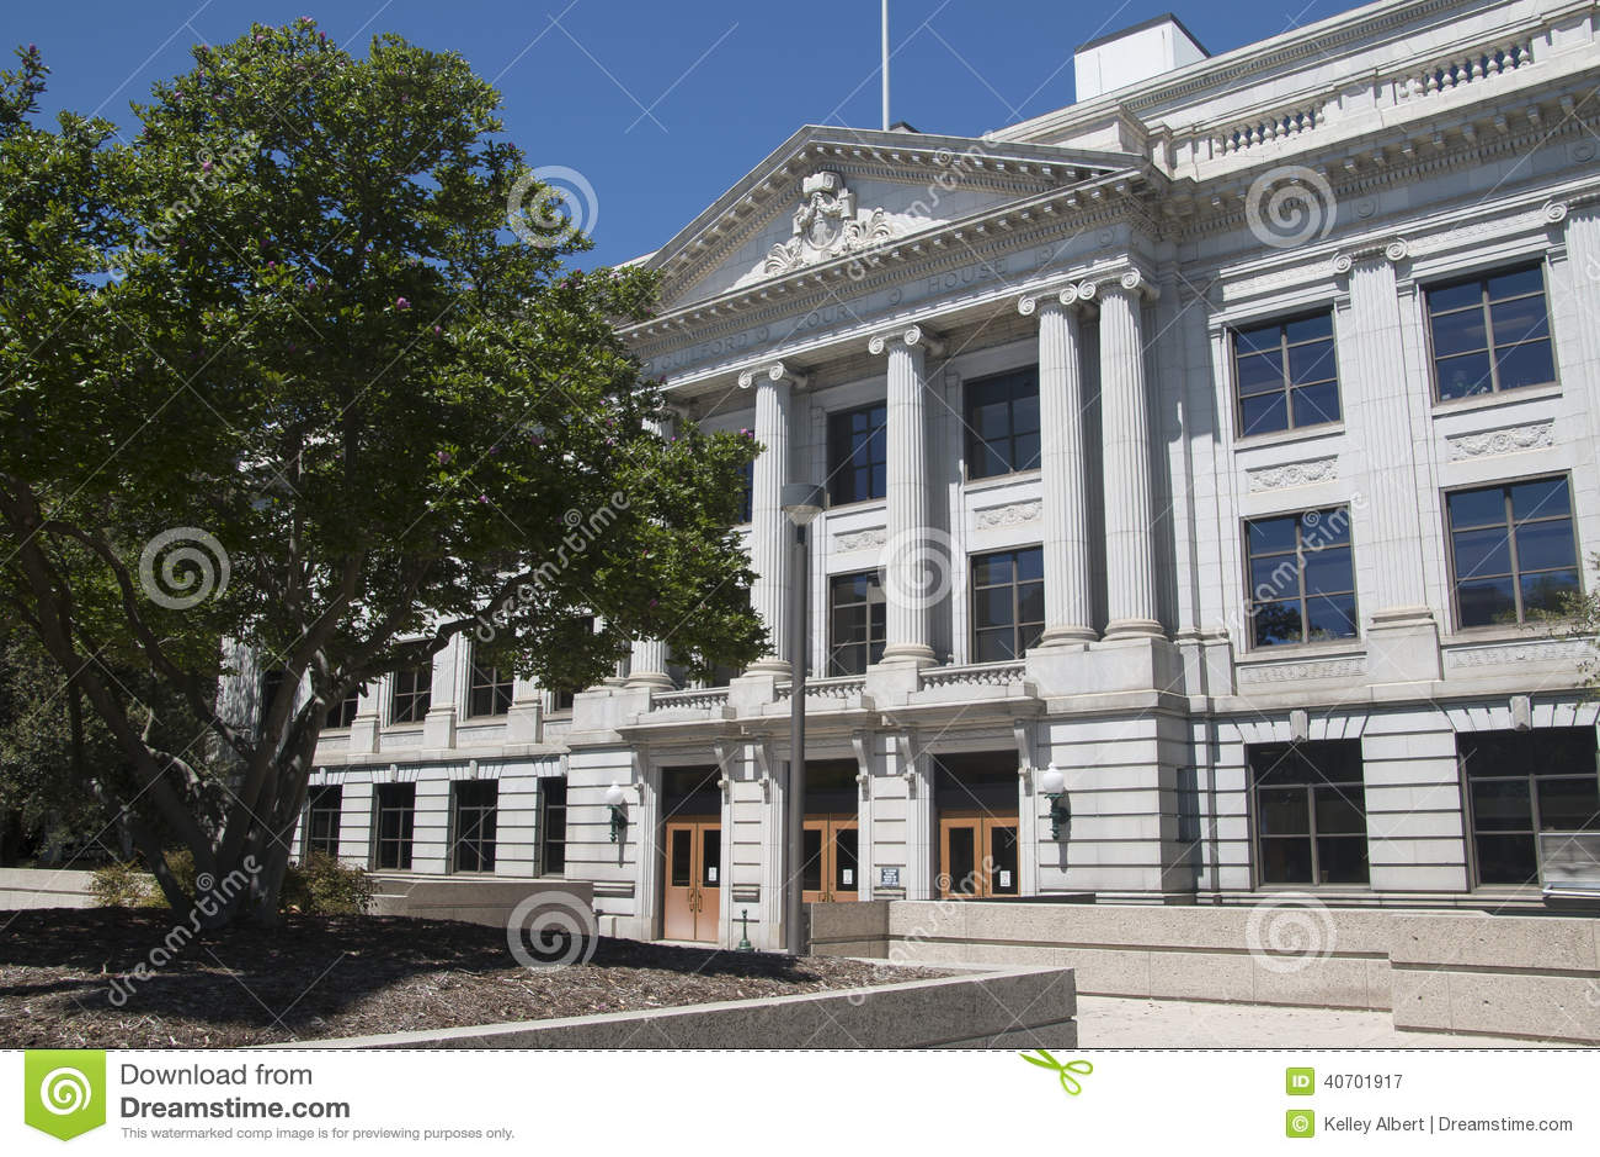 Courthouse In Greensboro, NC (North Carolina) Stock Image